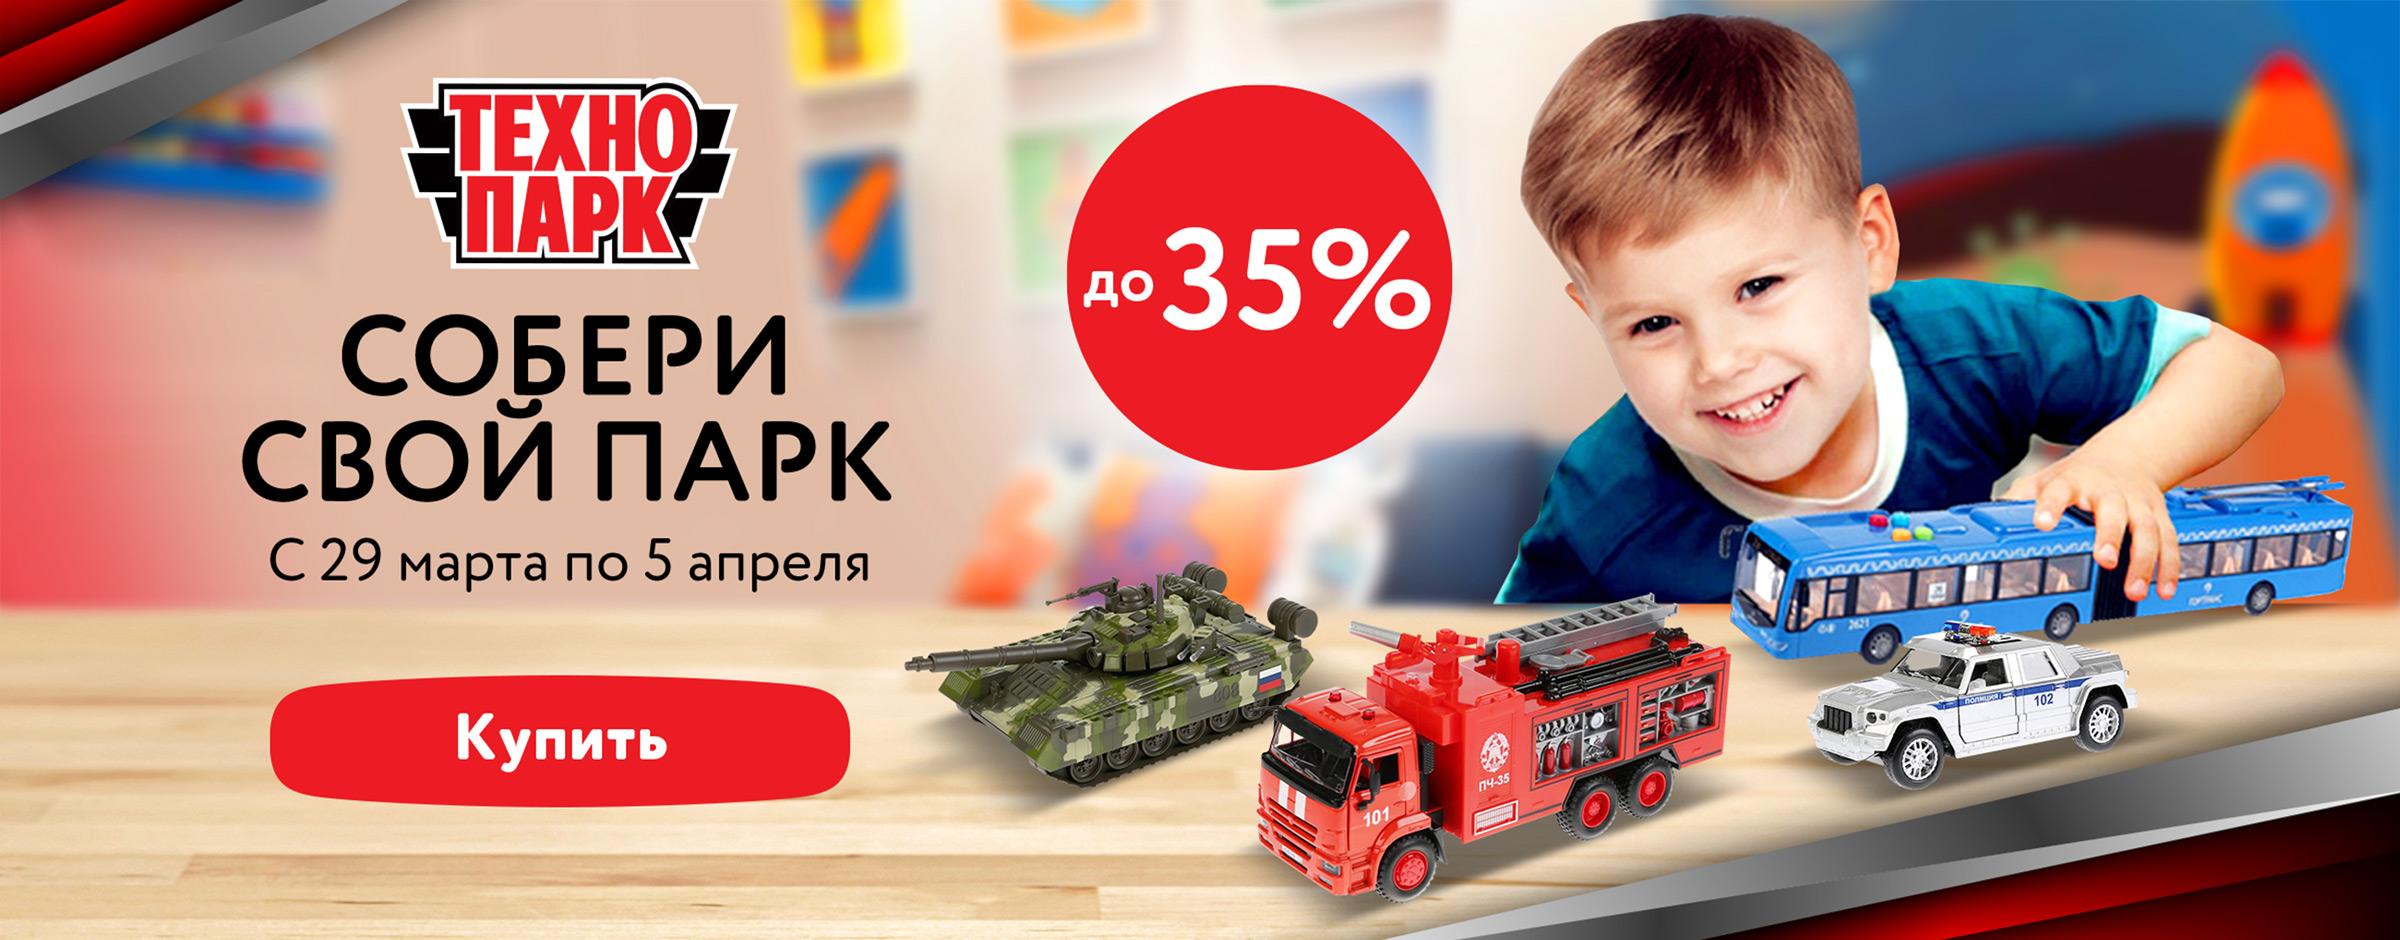 Скидка до 35% на игрушки Технопарк